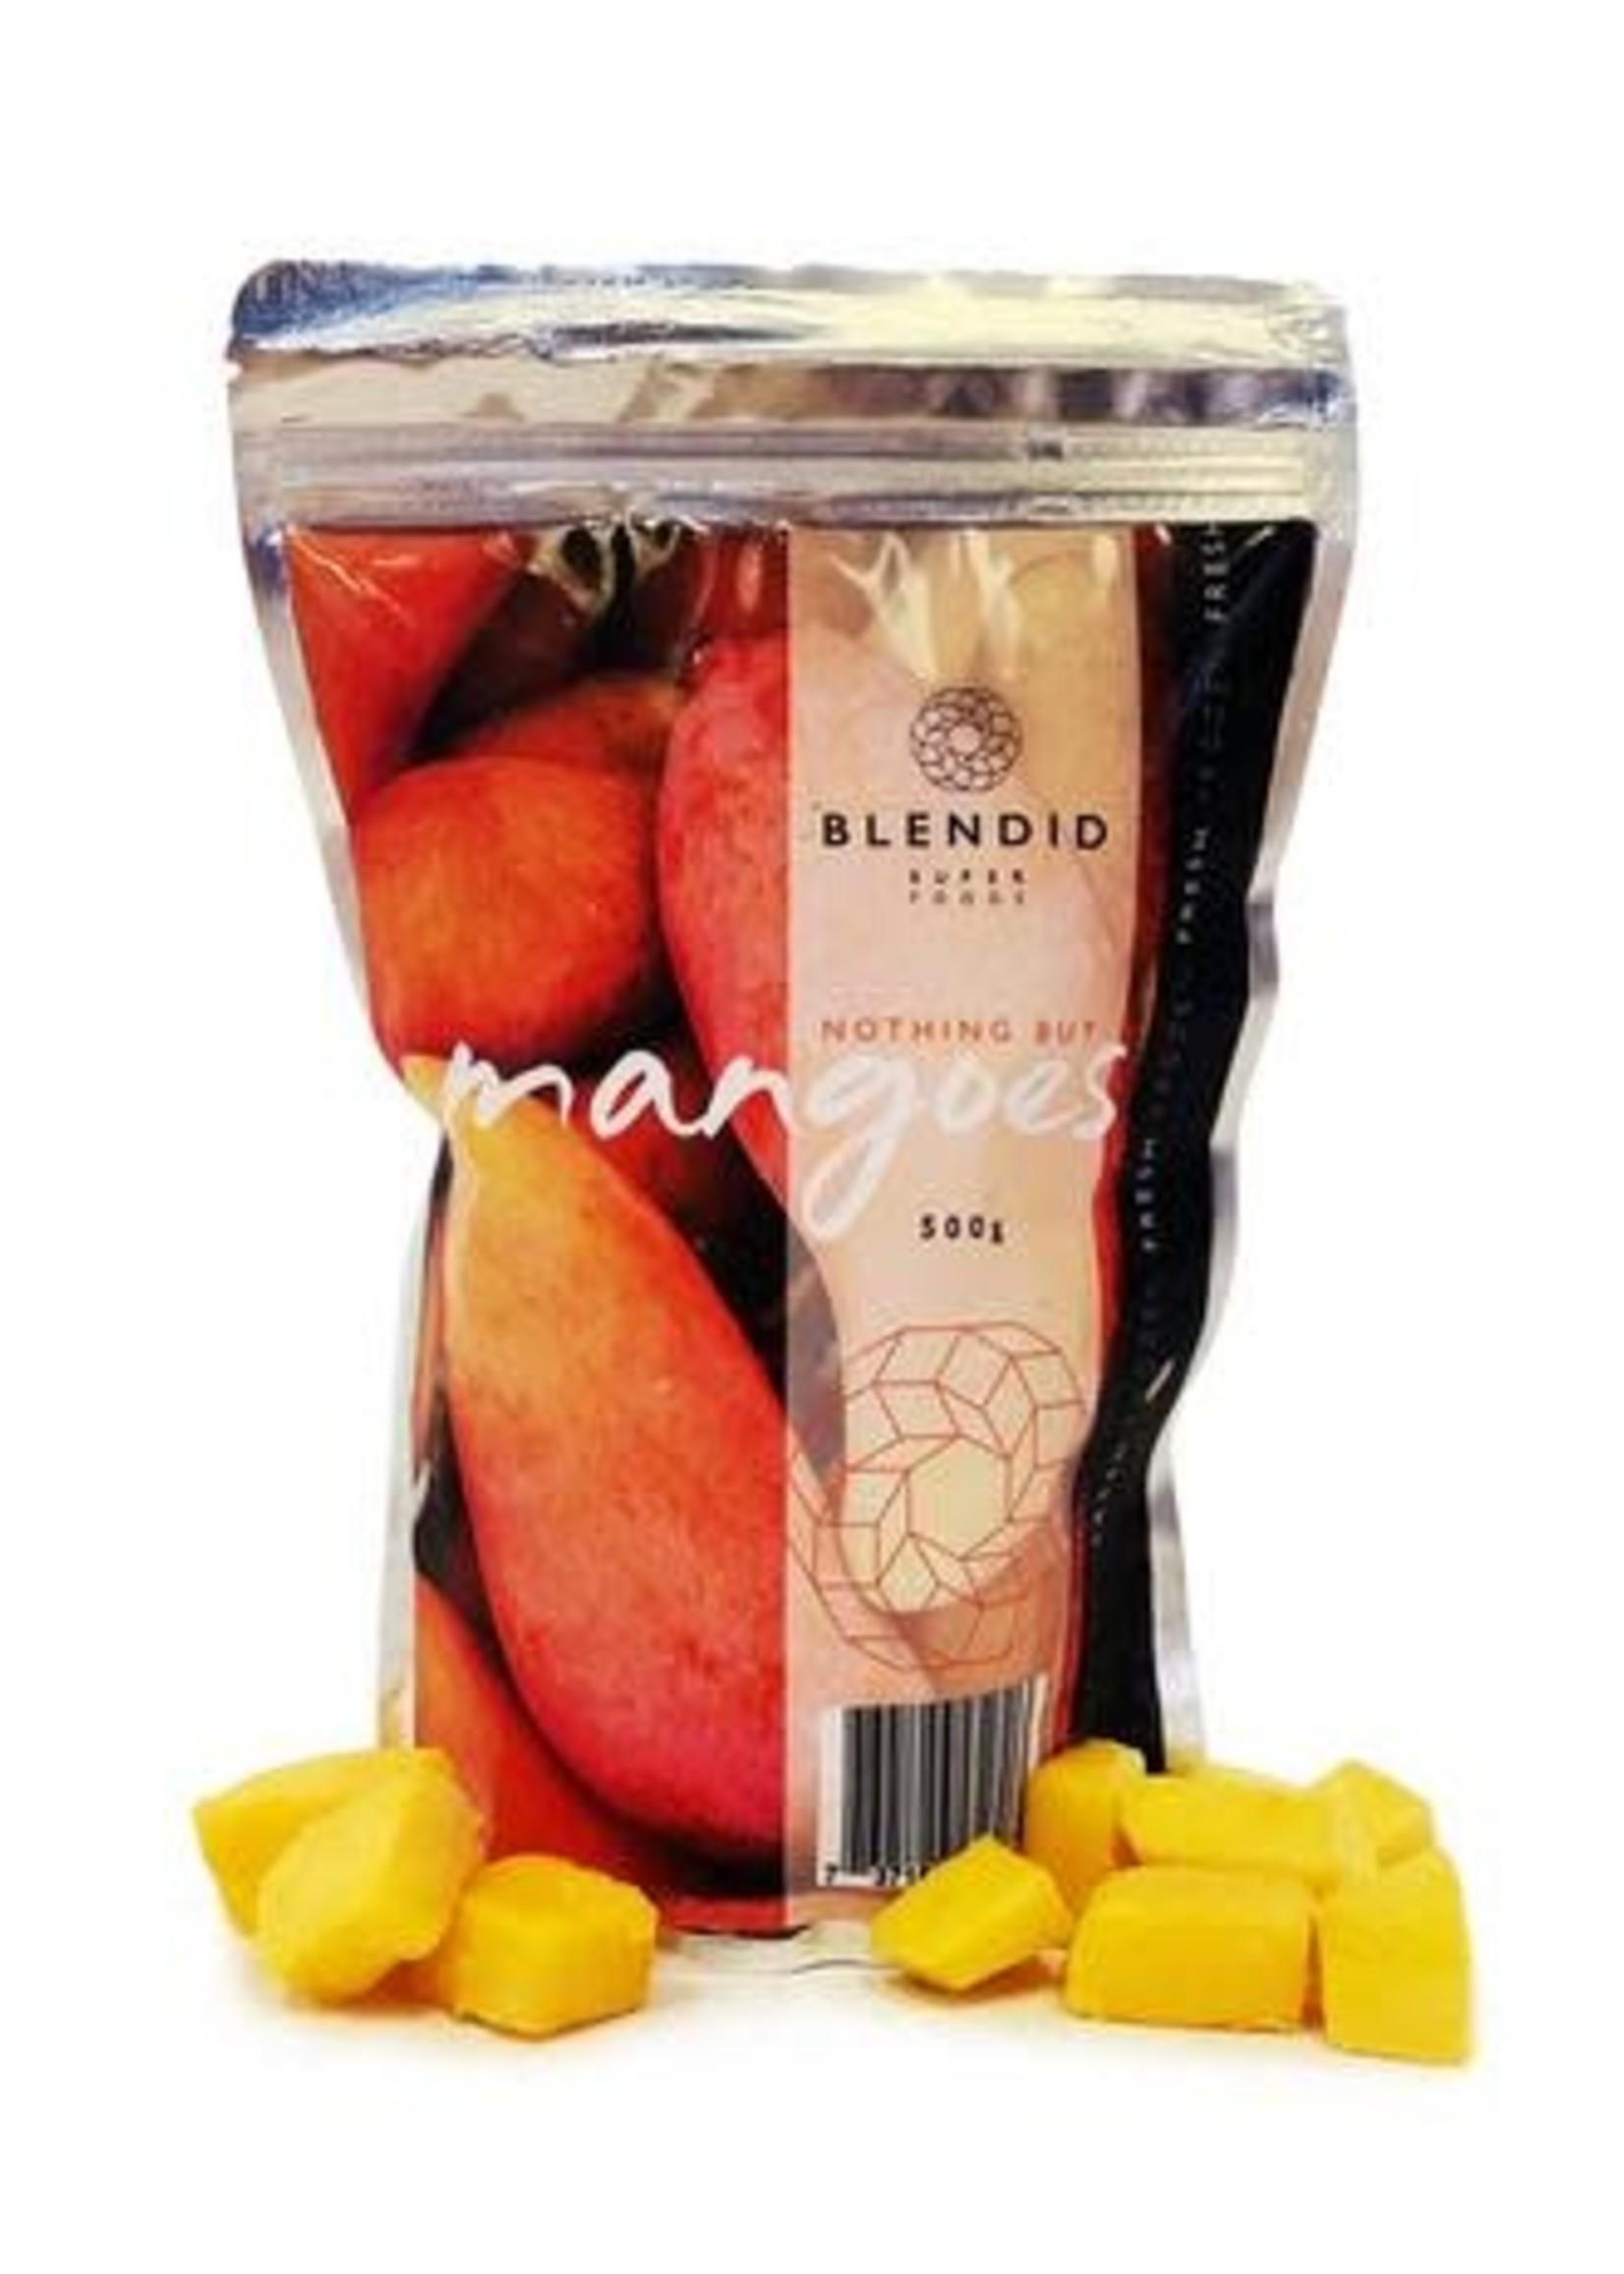 Blendid Blendid - Frozen mango